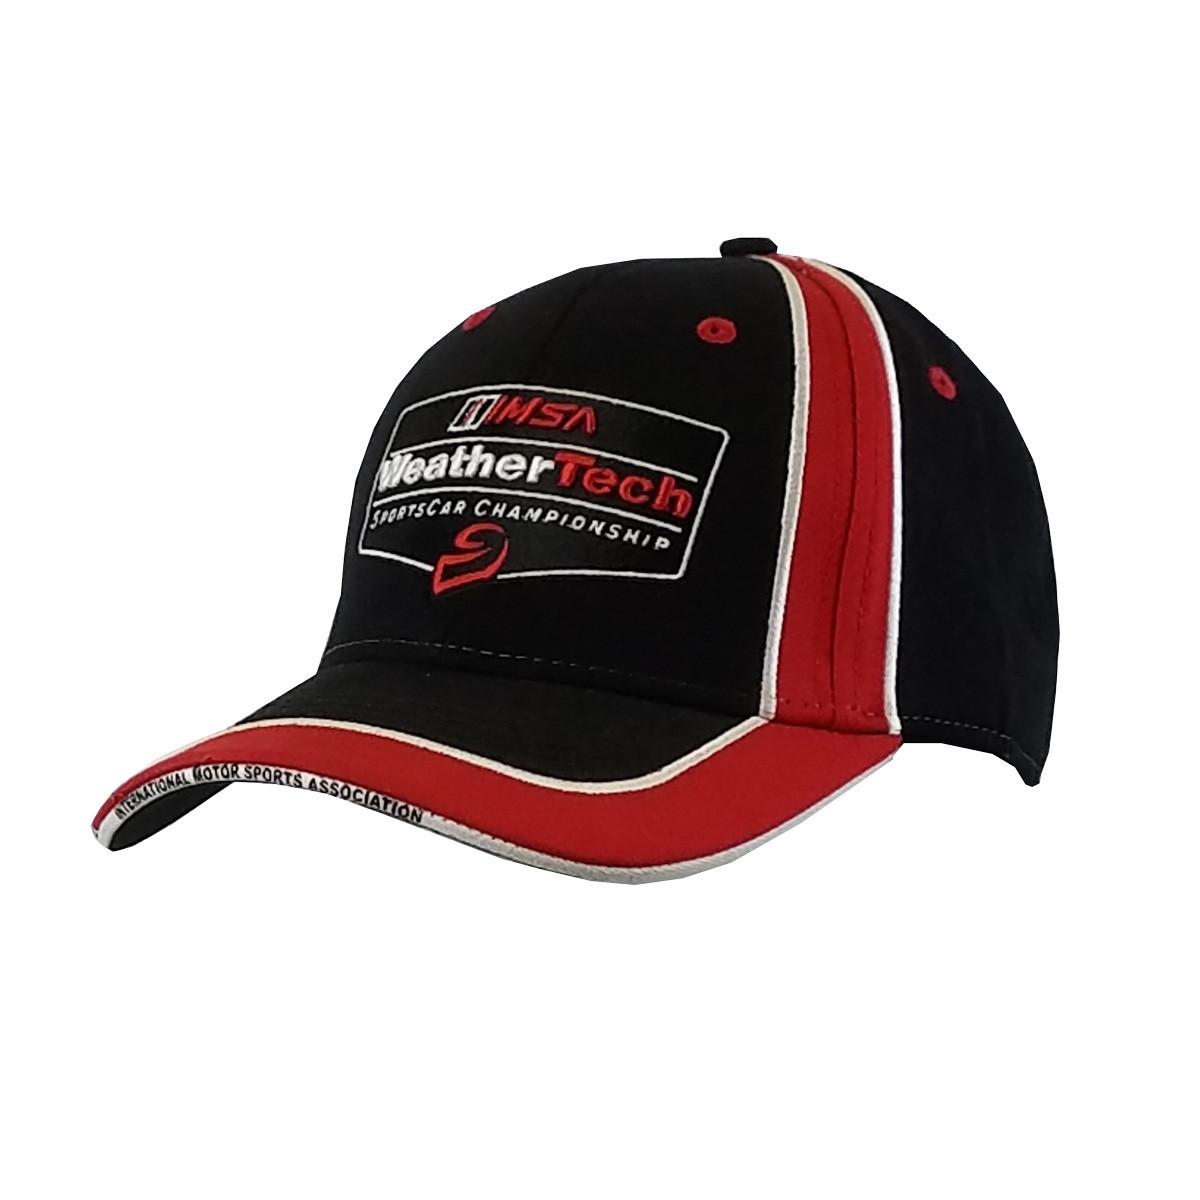 Weathertech 2019 Hat Black/Red